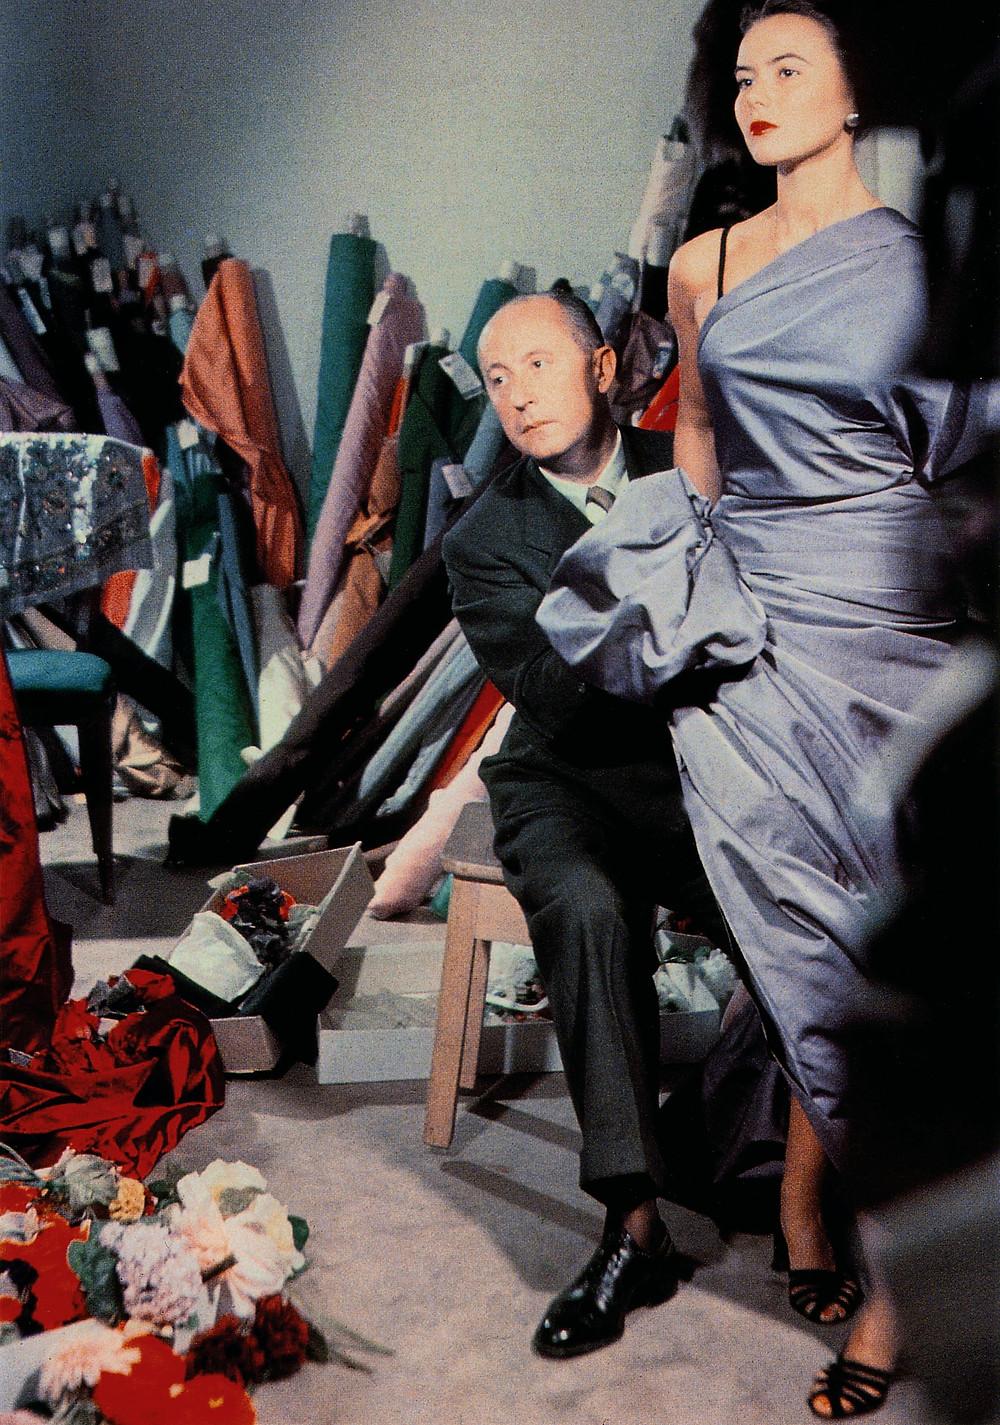 Christian Dior drapes fabric over fashion model Sylvie circa 1948. Photograph: Bellini/Christian Dior